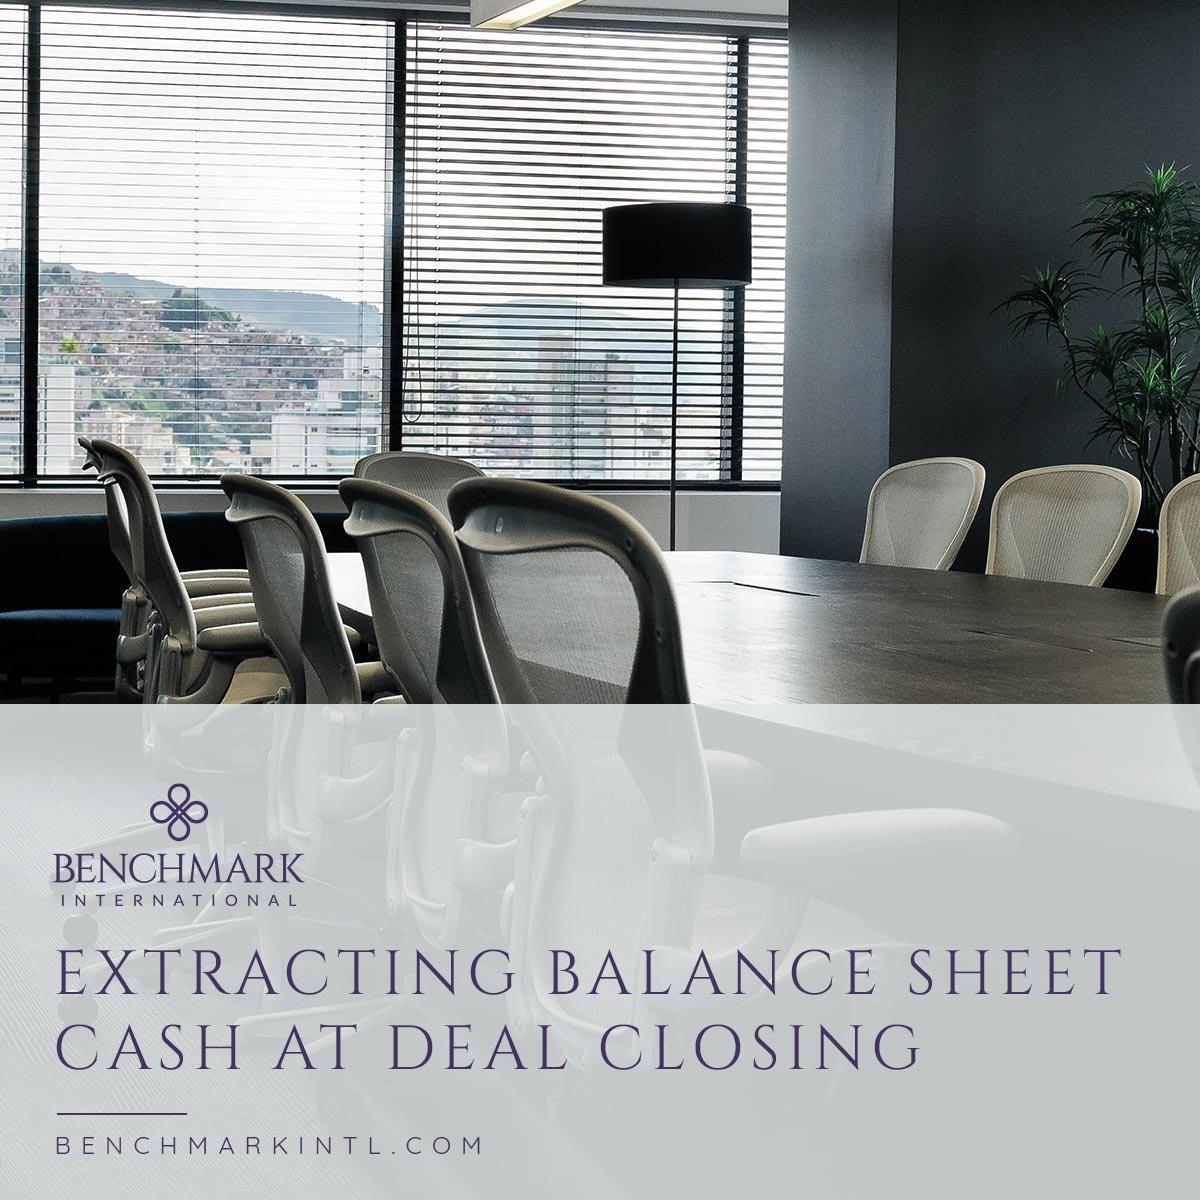 Extracting Balance Sheet Cash At Deal Closing